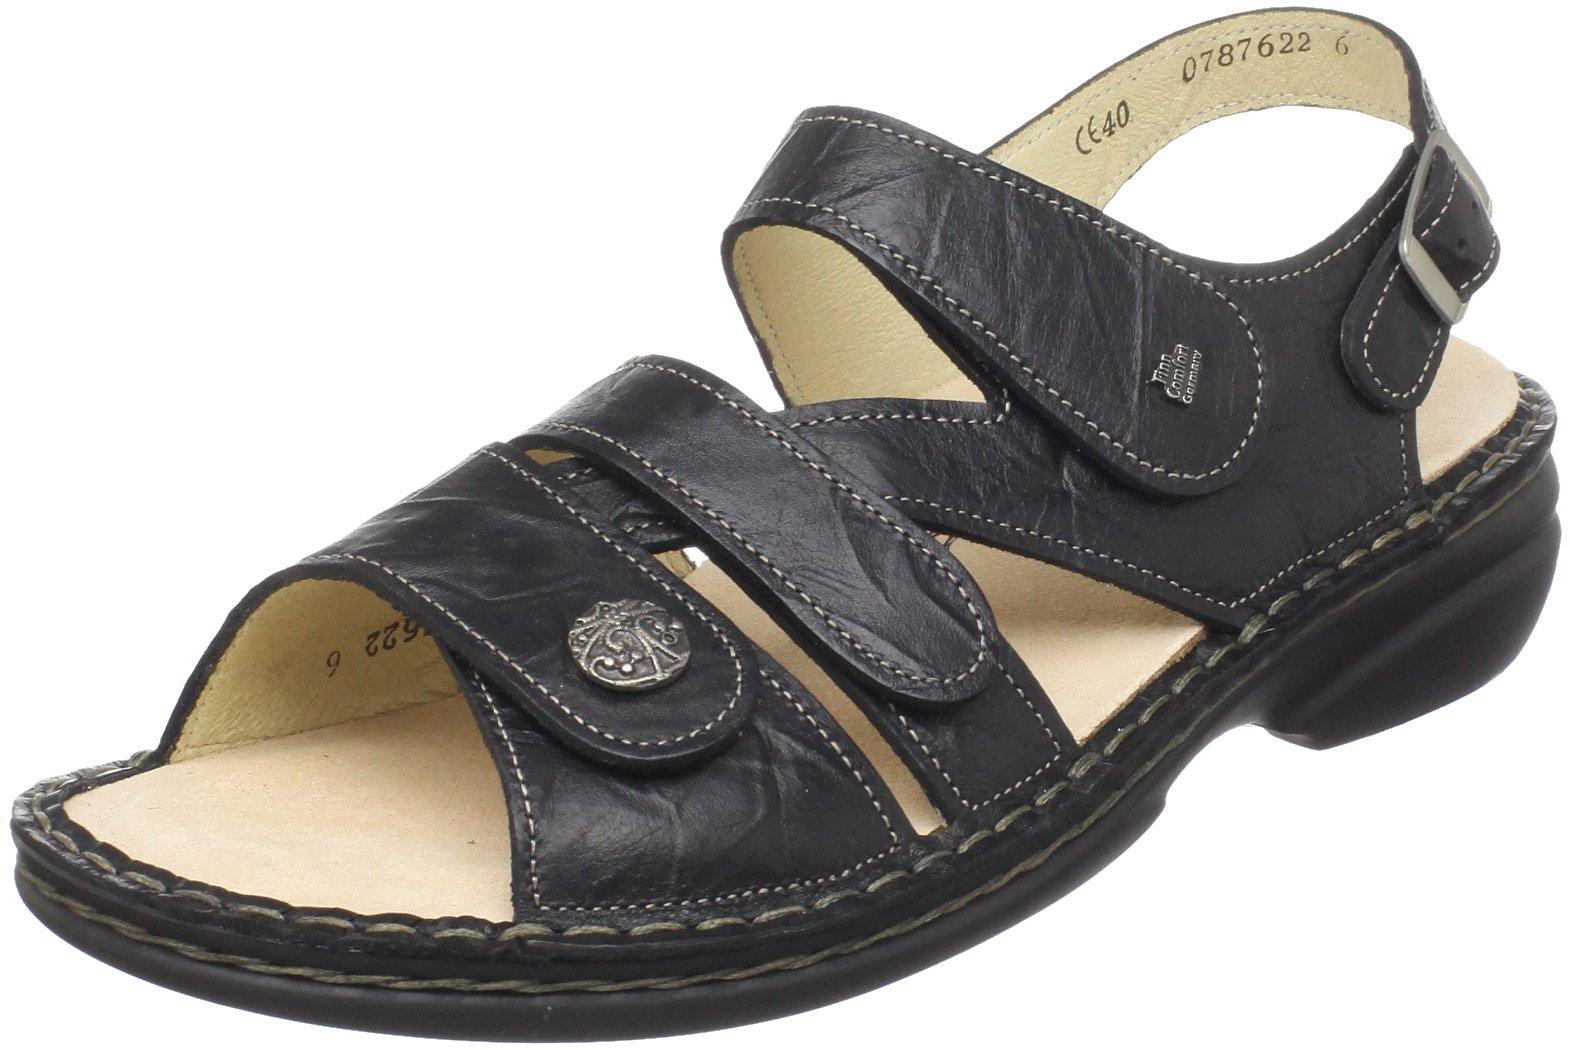 Finn Comfort Women's Gomera Ankle-Strap Sandal,Black Plisseelight,42 EU/11 M US